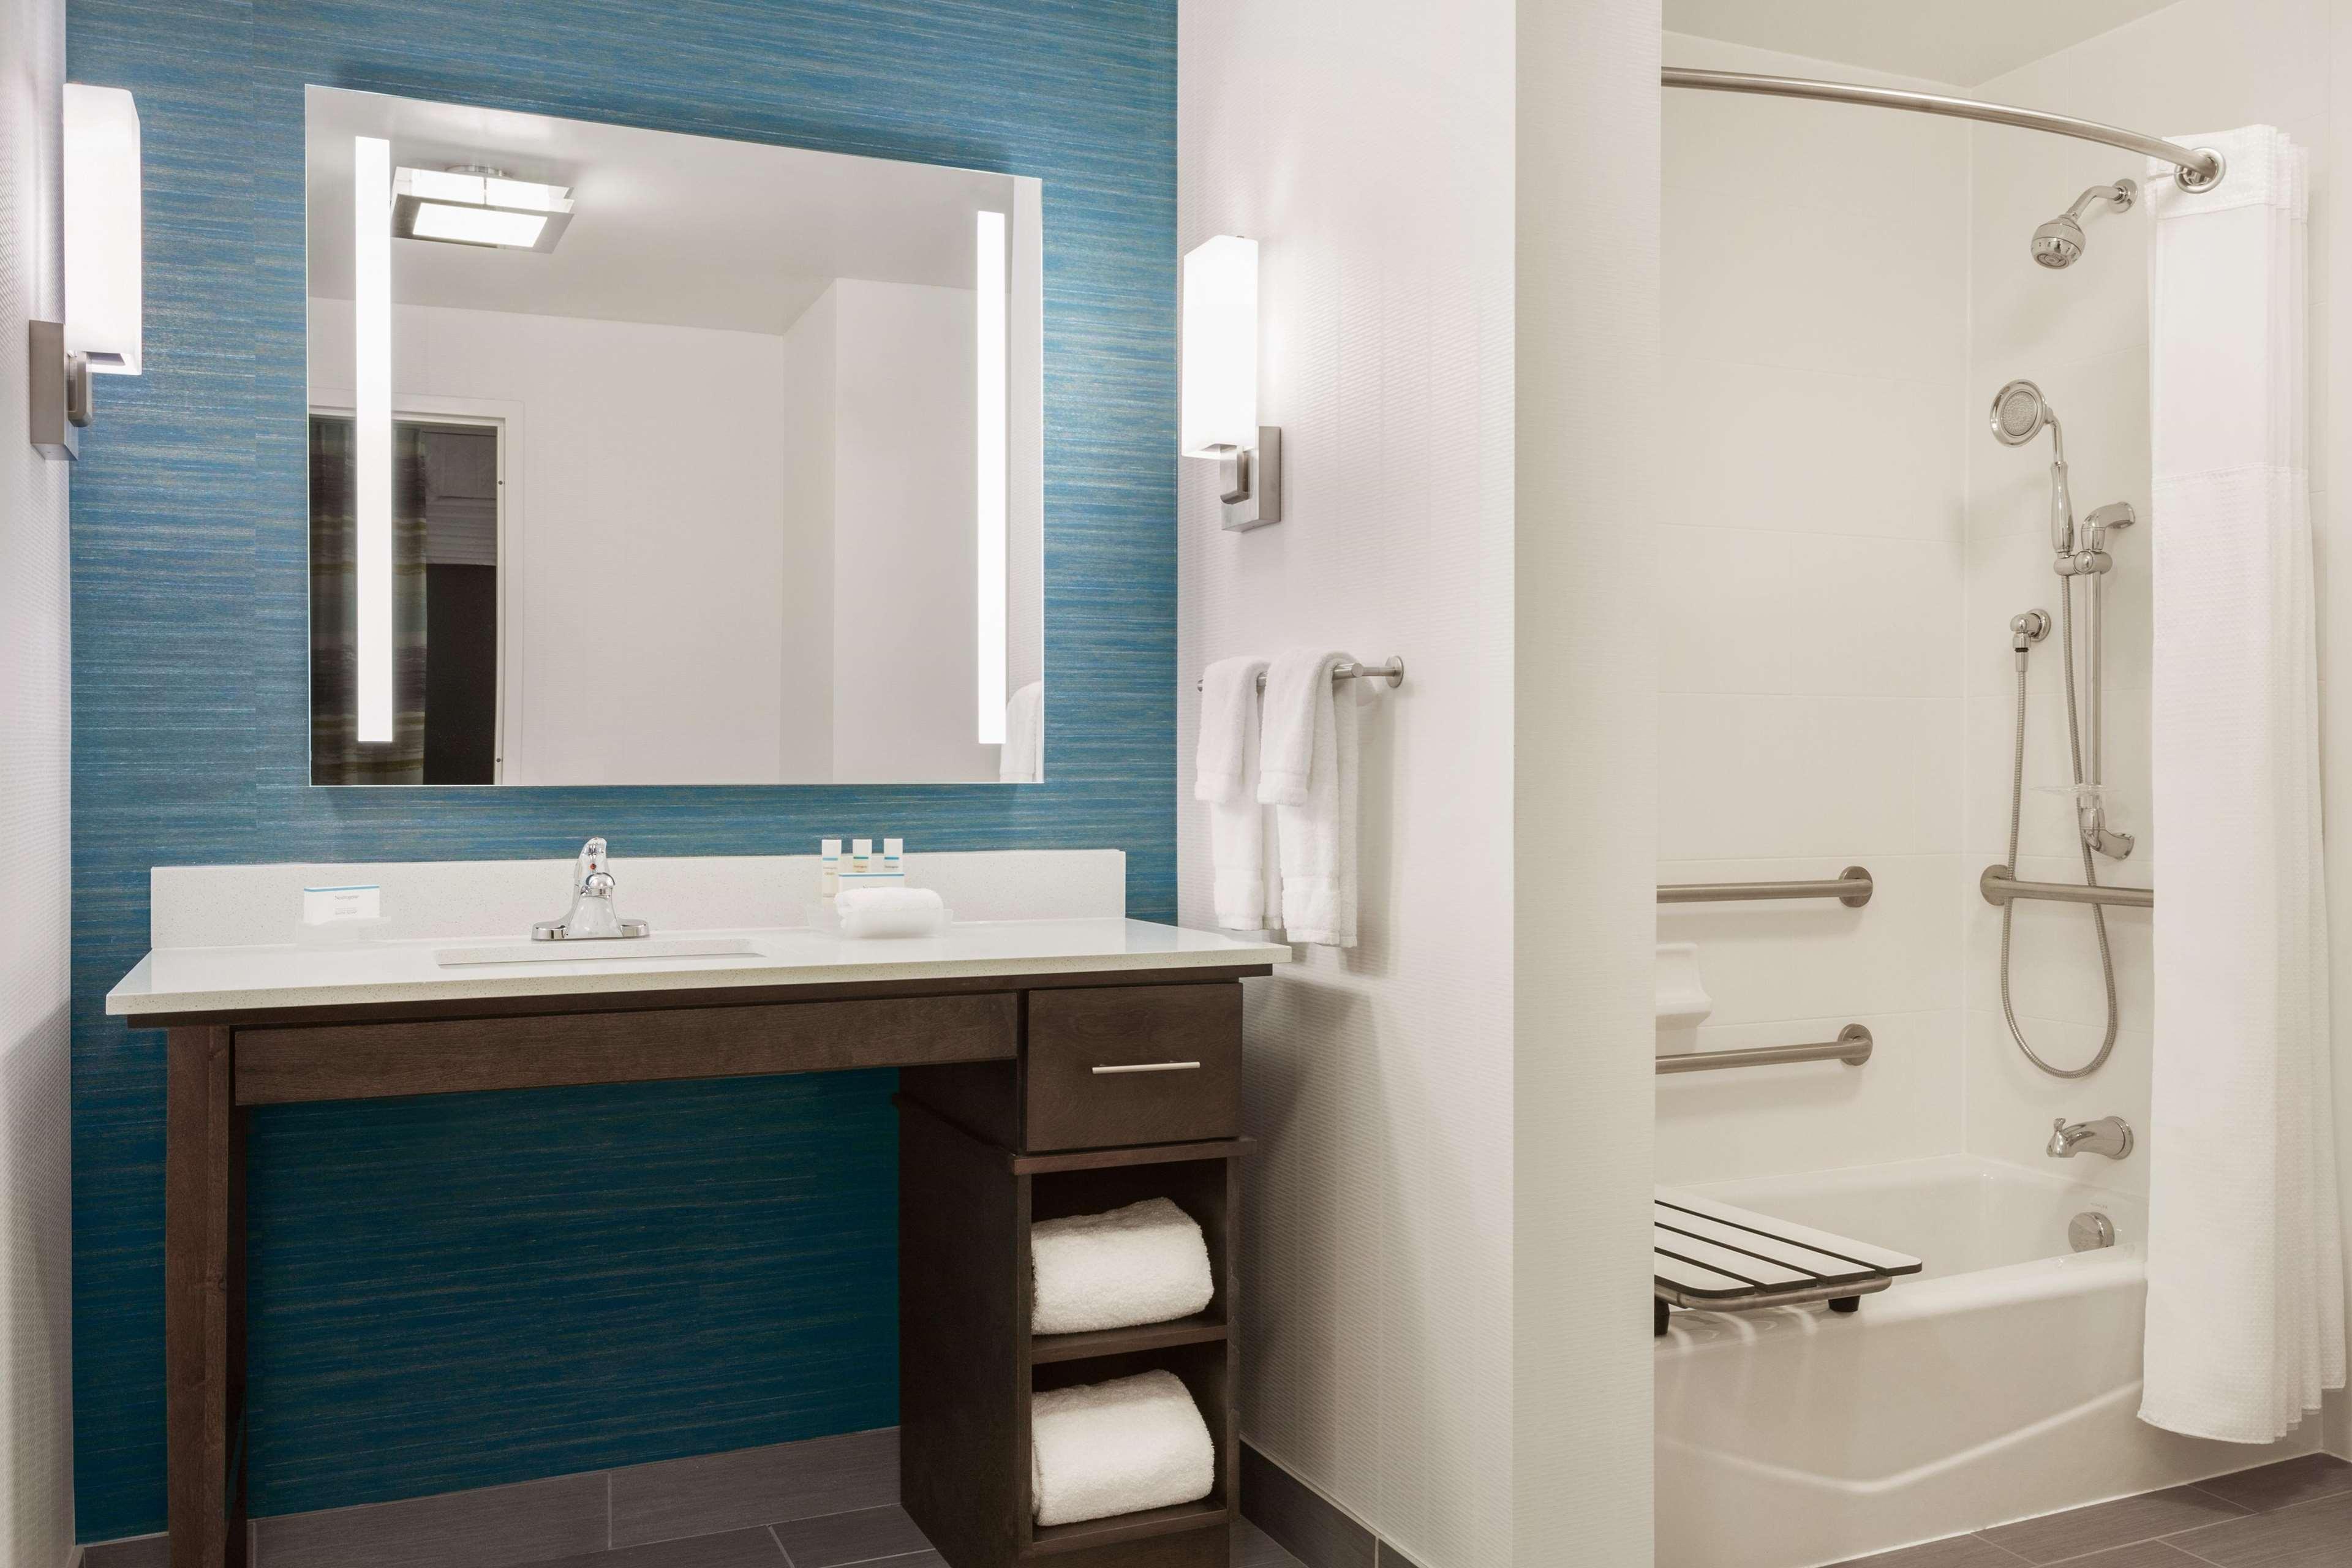 Homewood Suites by Hilton Charlotte/SouthPark image 33